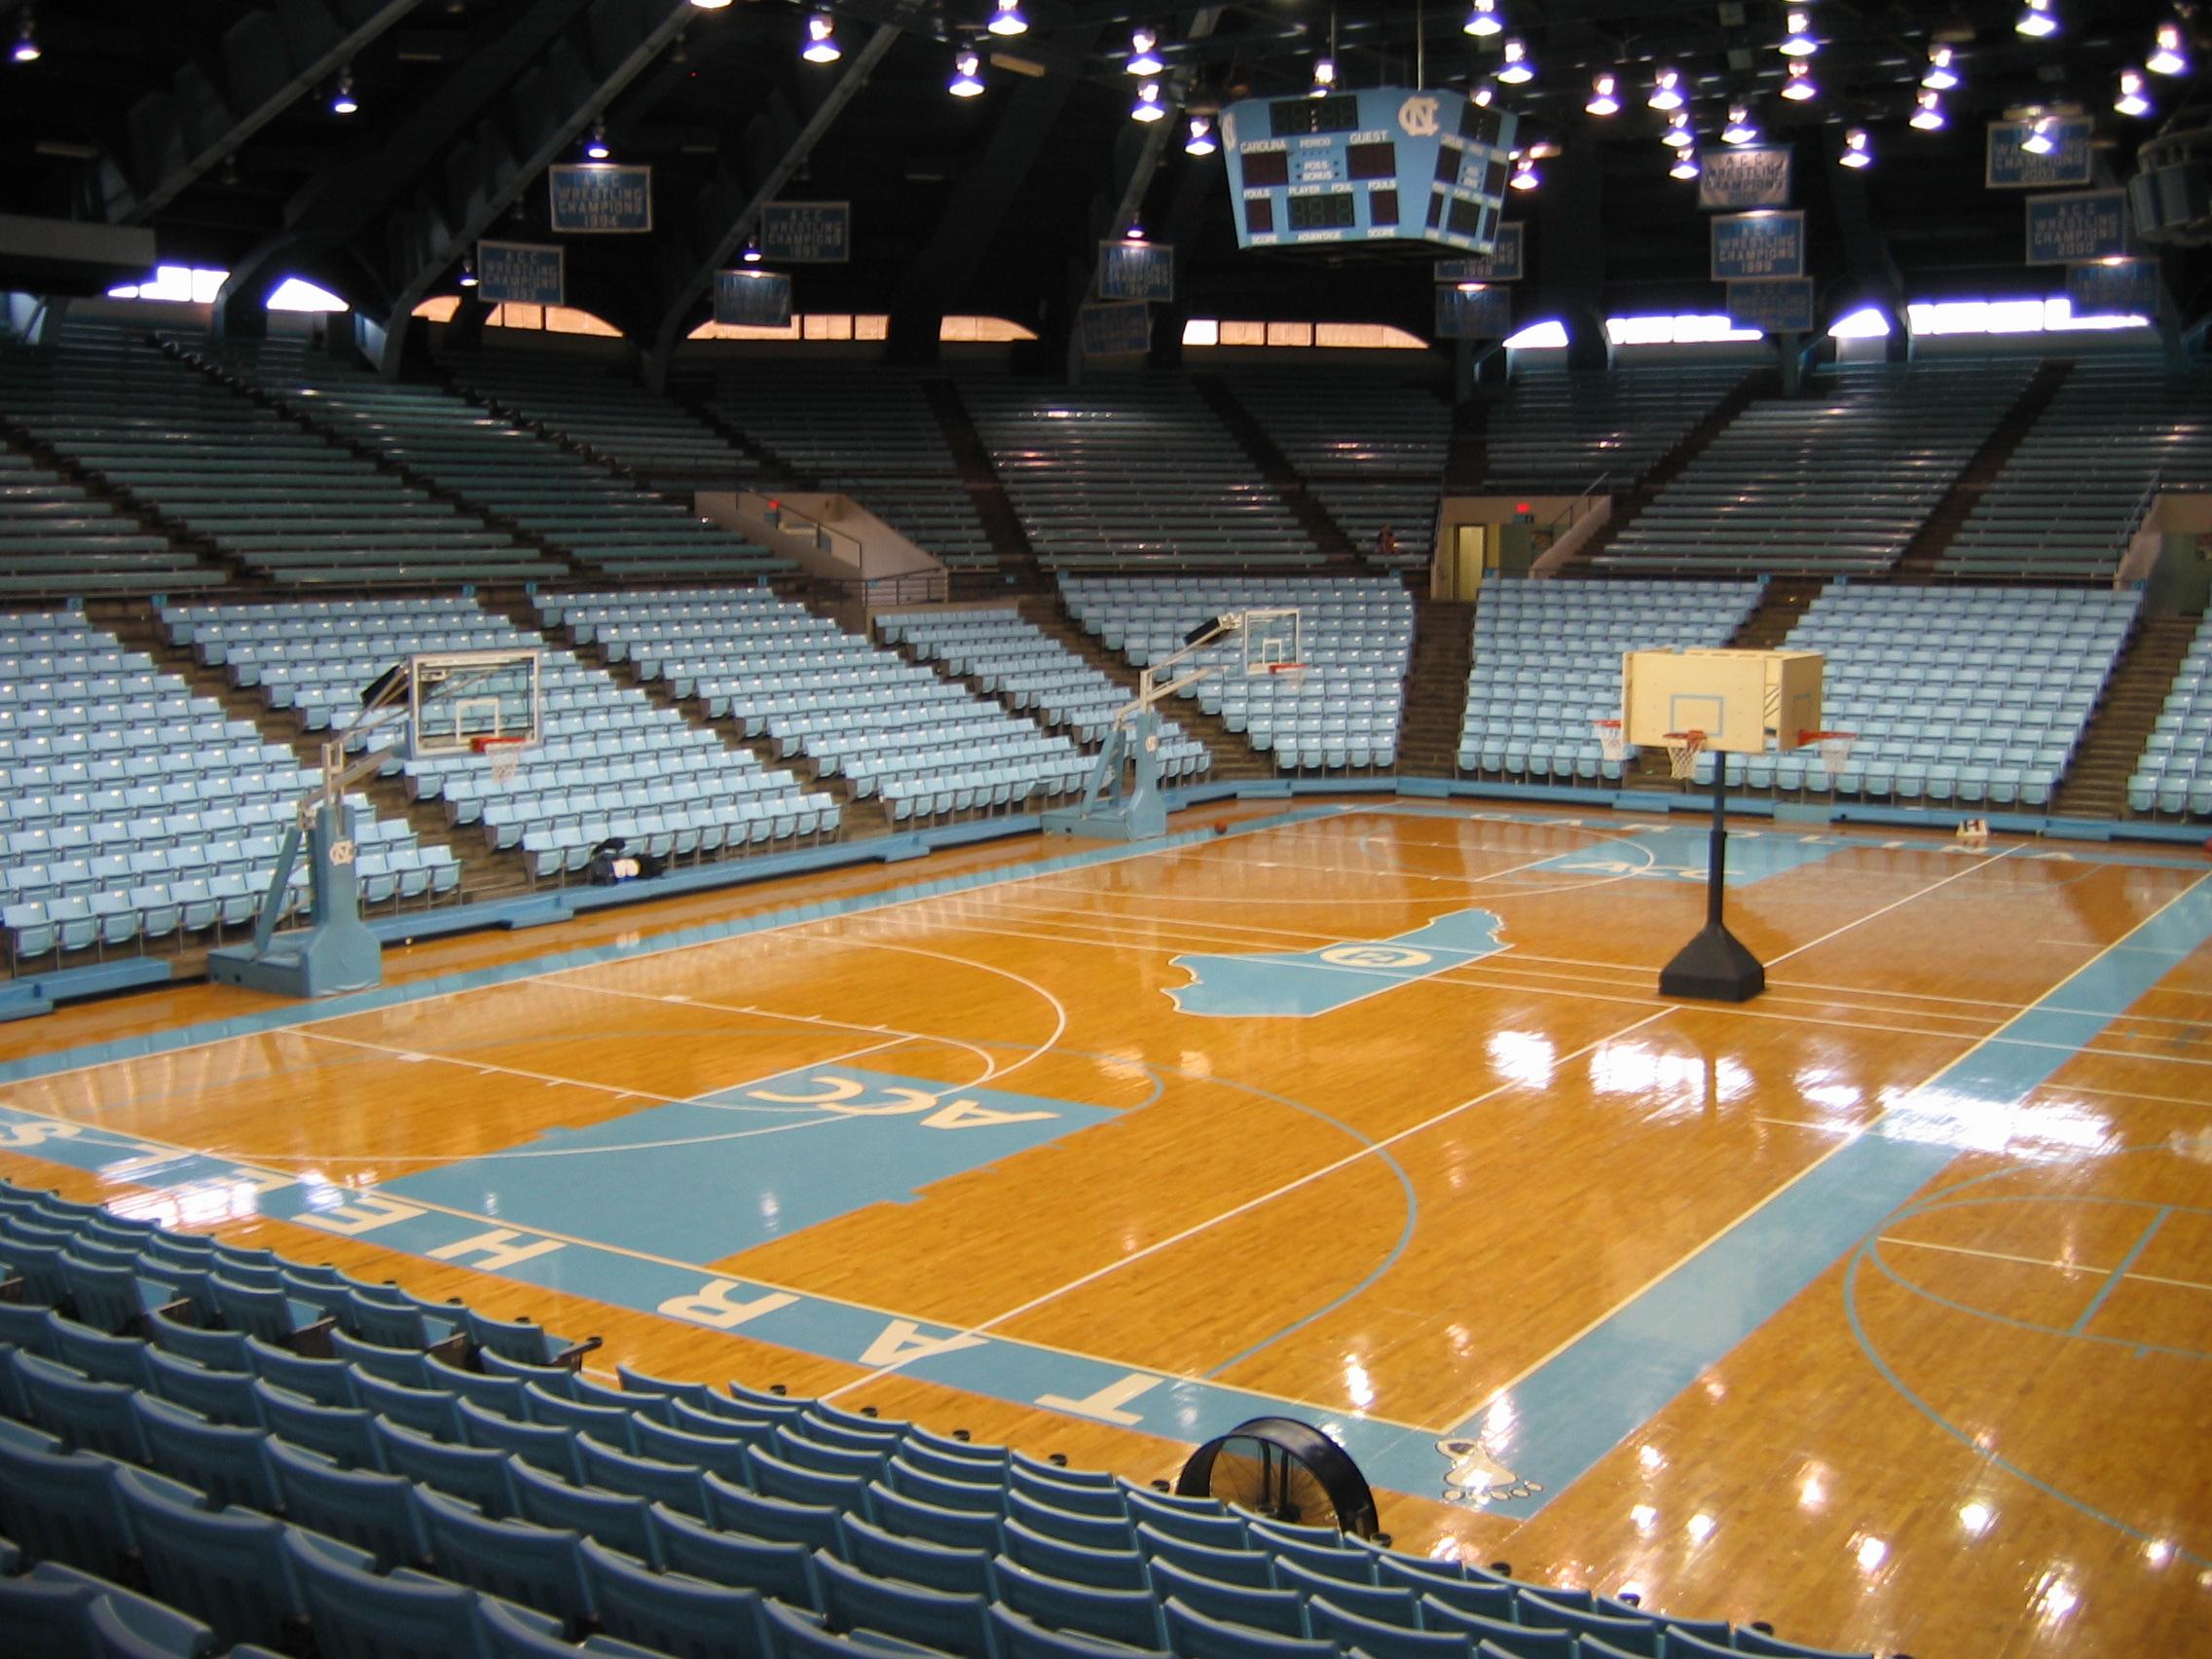 File:Carmichael Auditorium.jpg - Wikimedia Commons